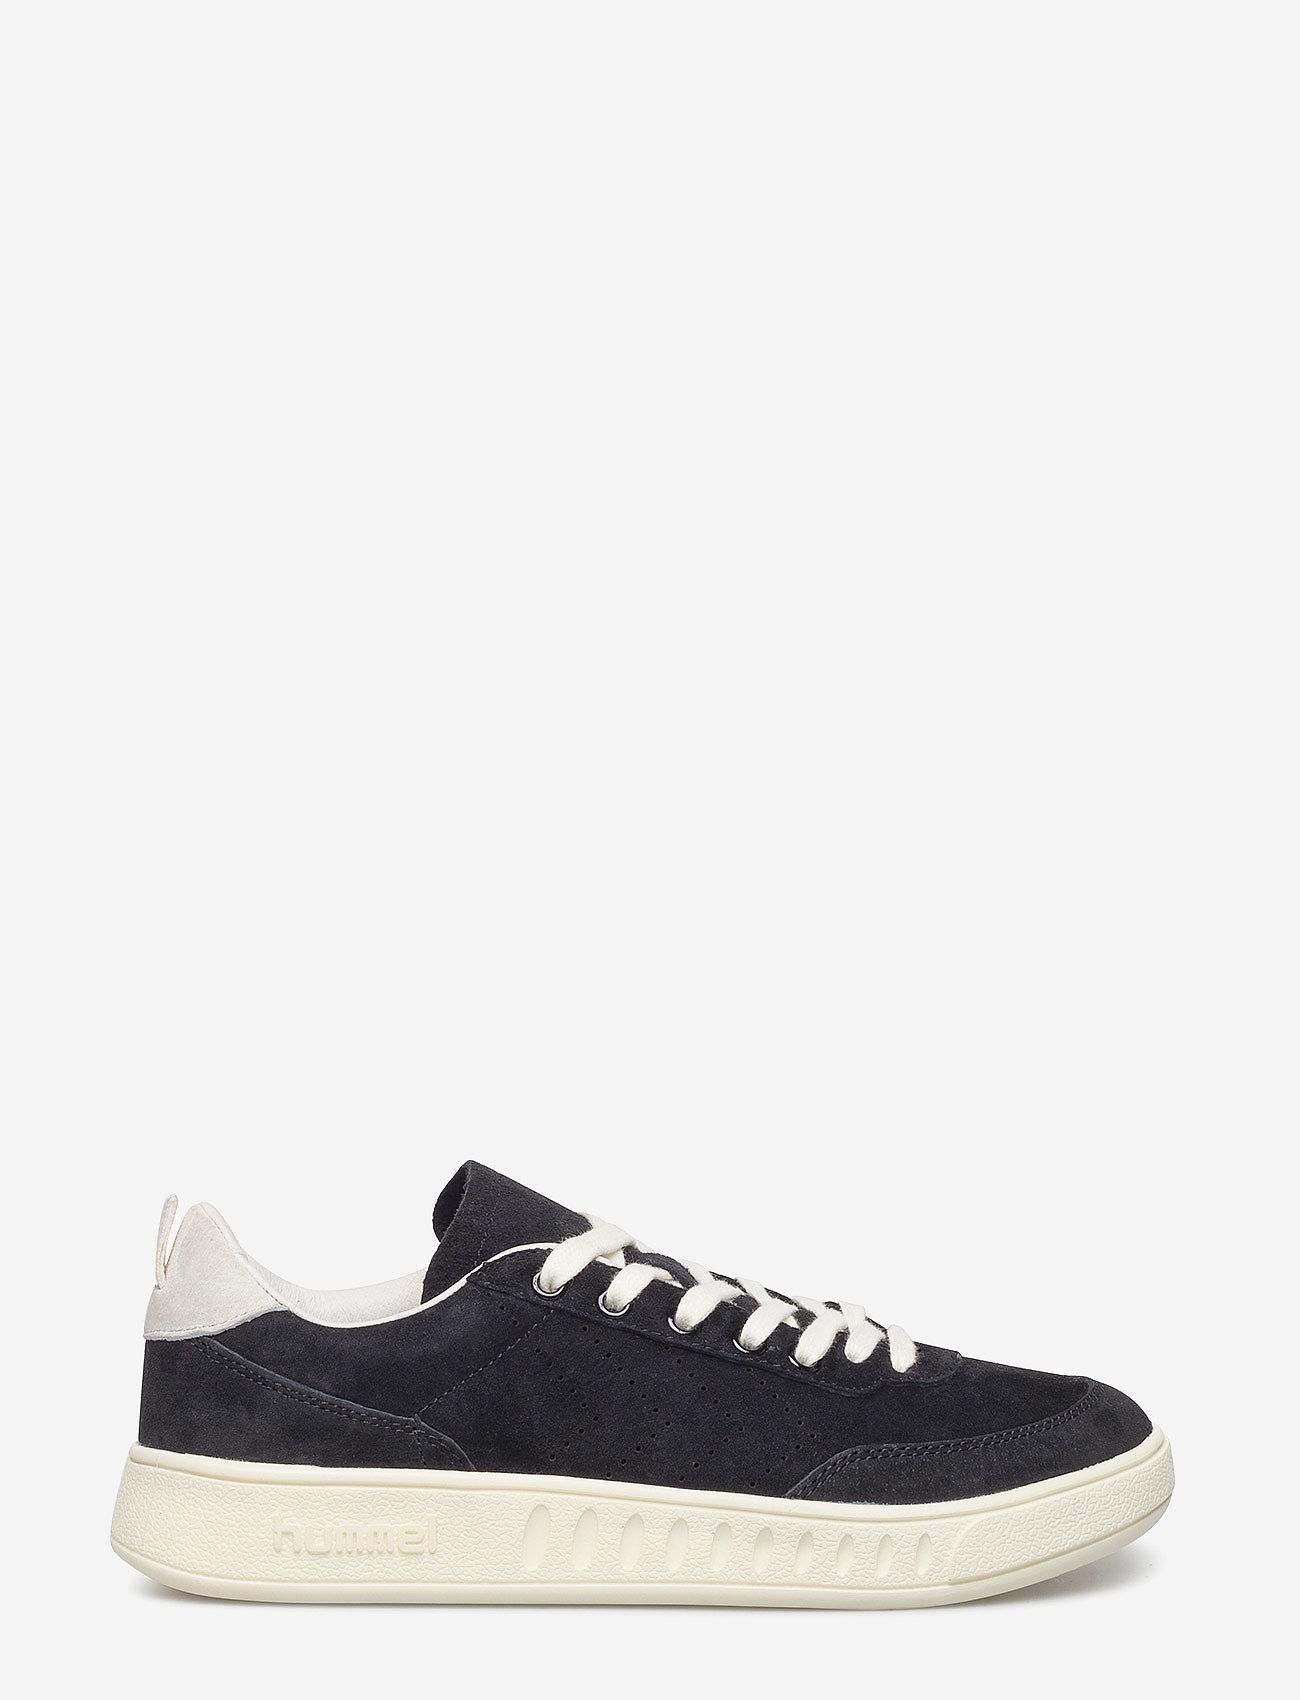 Hummel - SUPER TRIMM CASUAL - low top sneakers - black